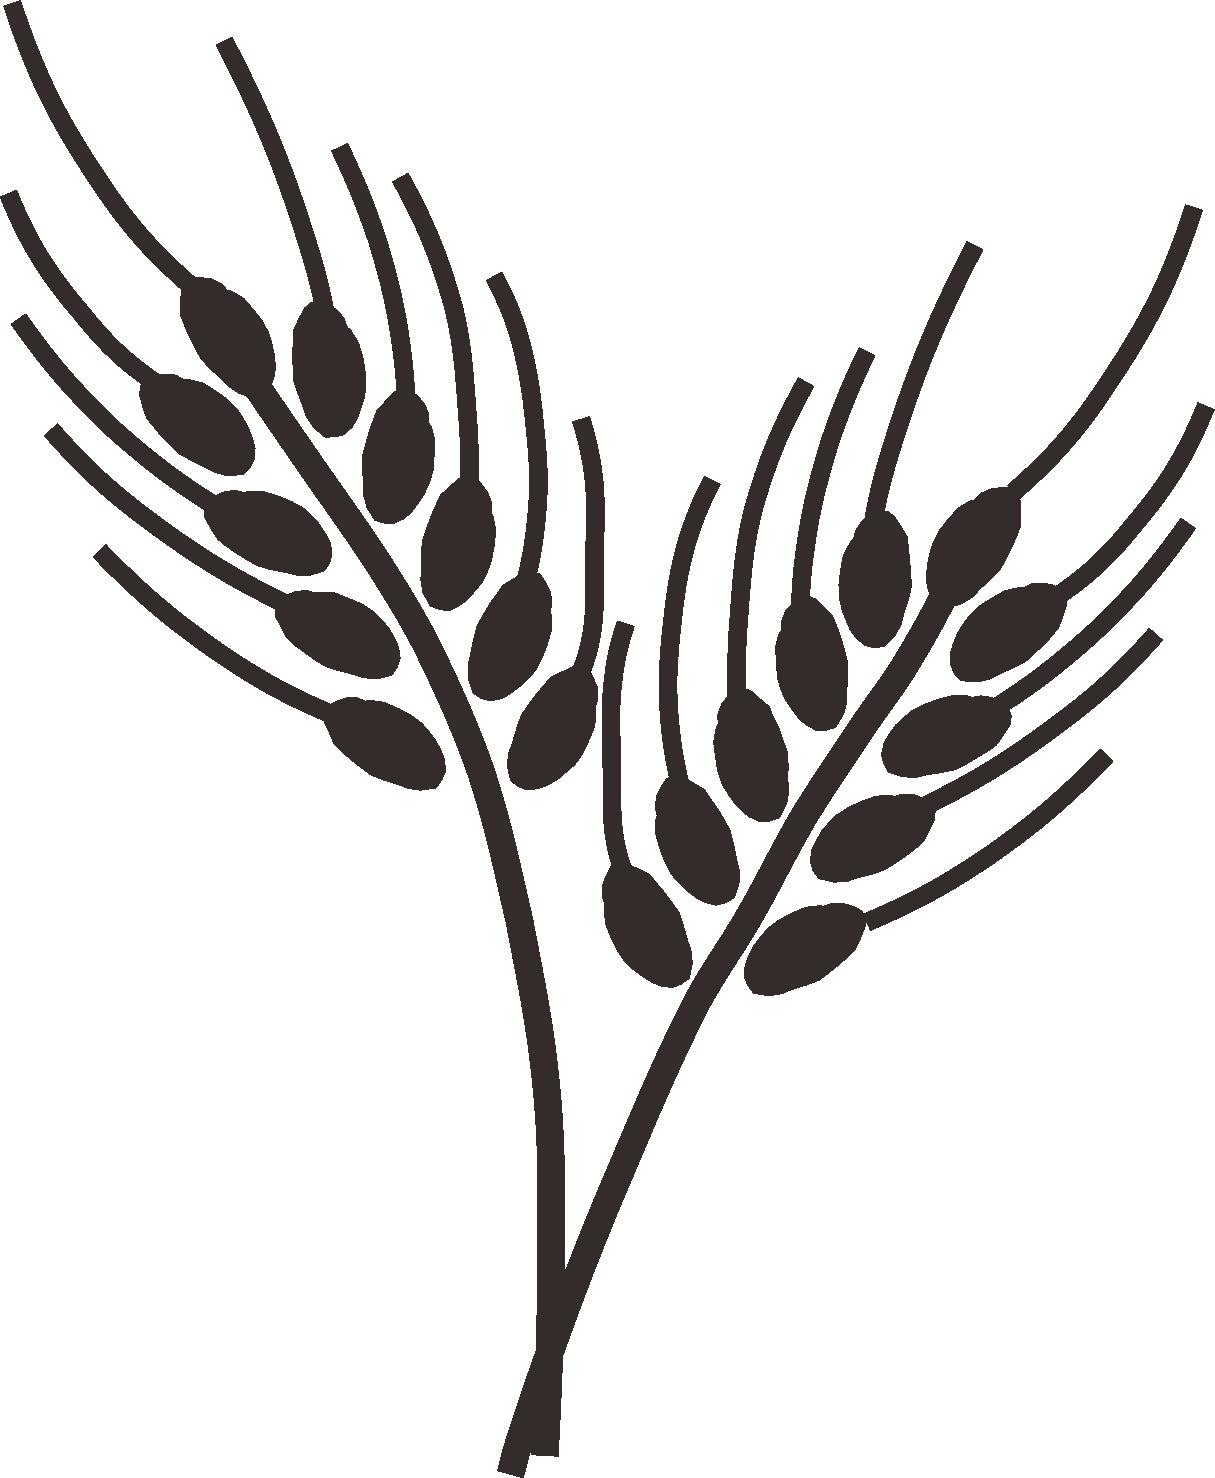 Wheatgrass dibujo o do. Clipart trees paddy